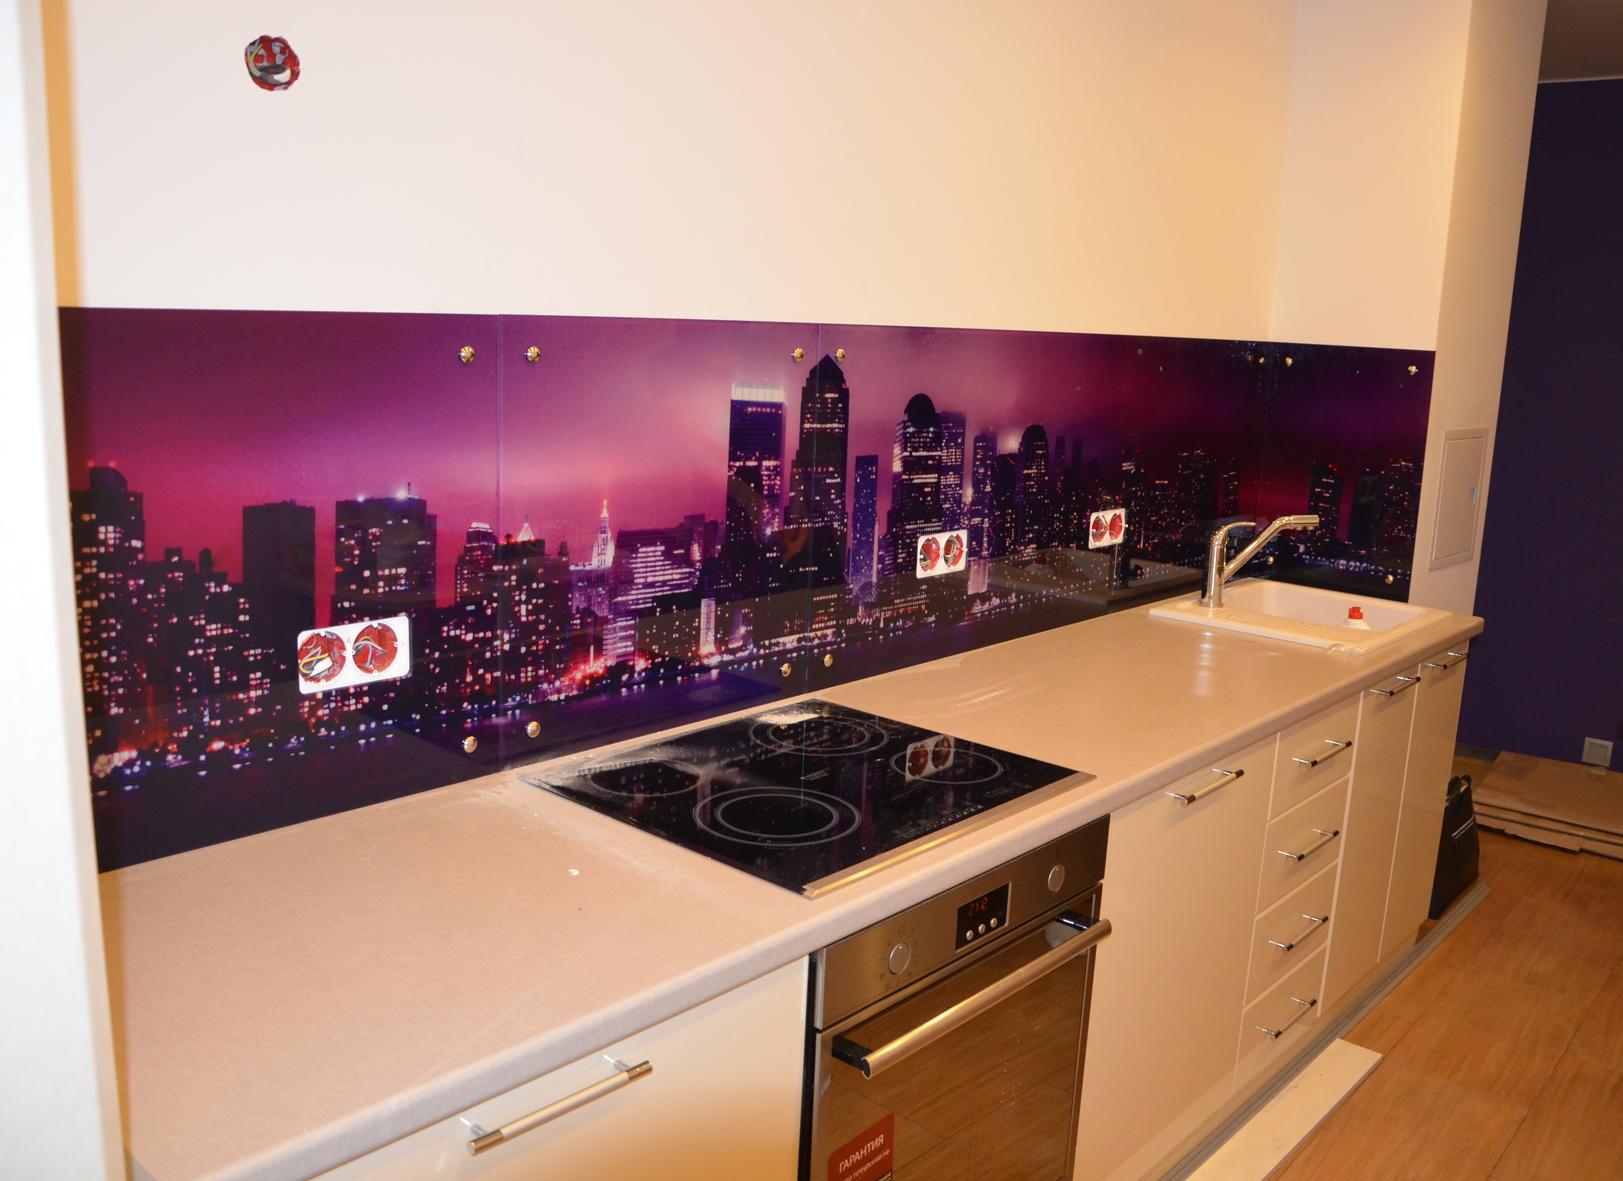 Аид мубарак, картинки для фотопечати на кухню